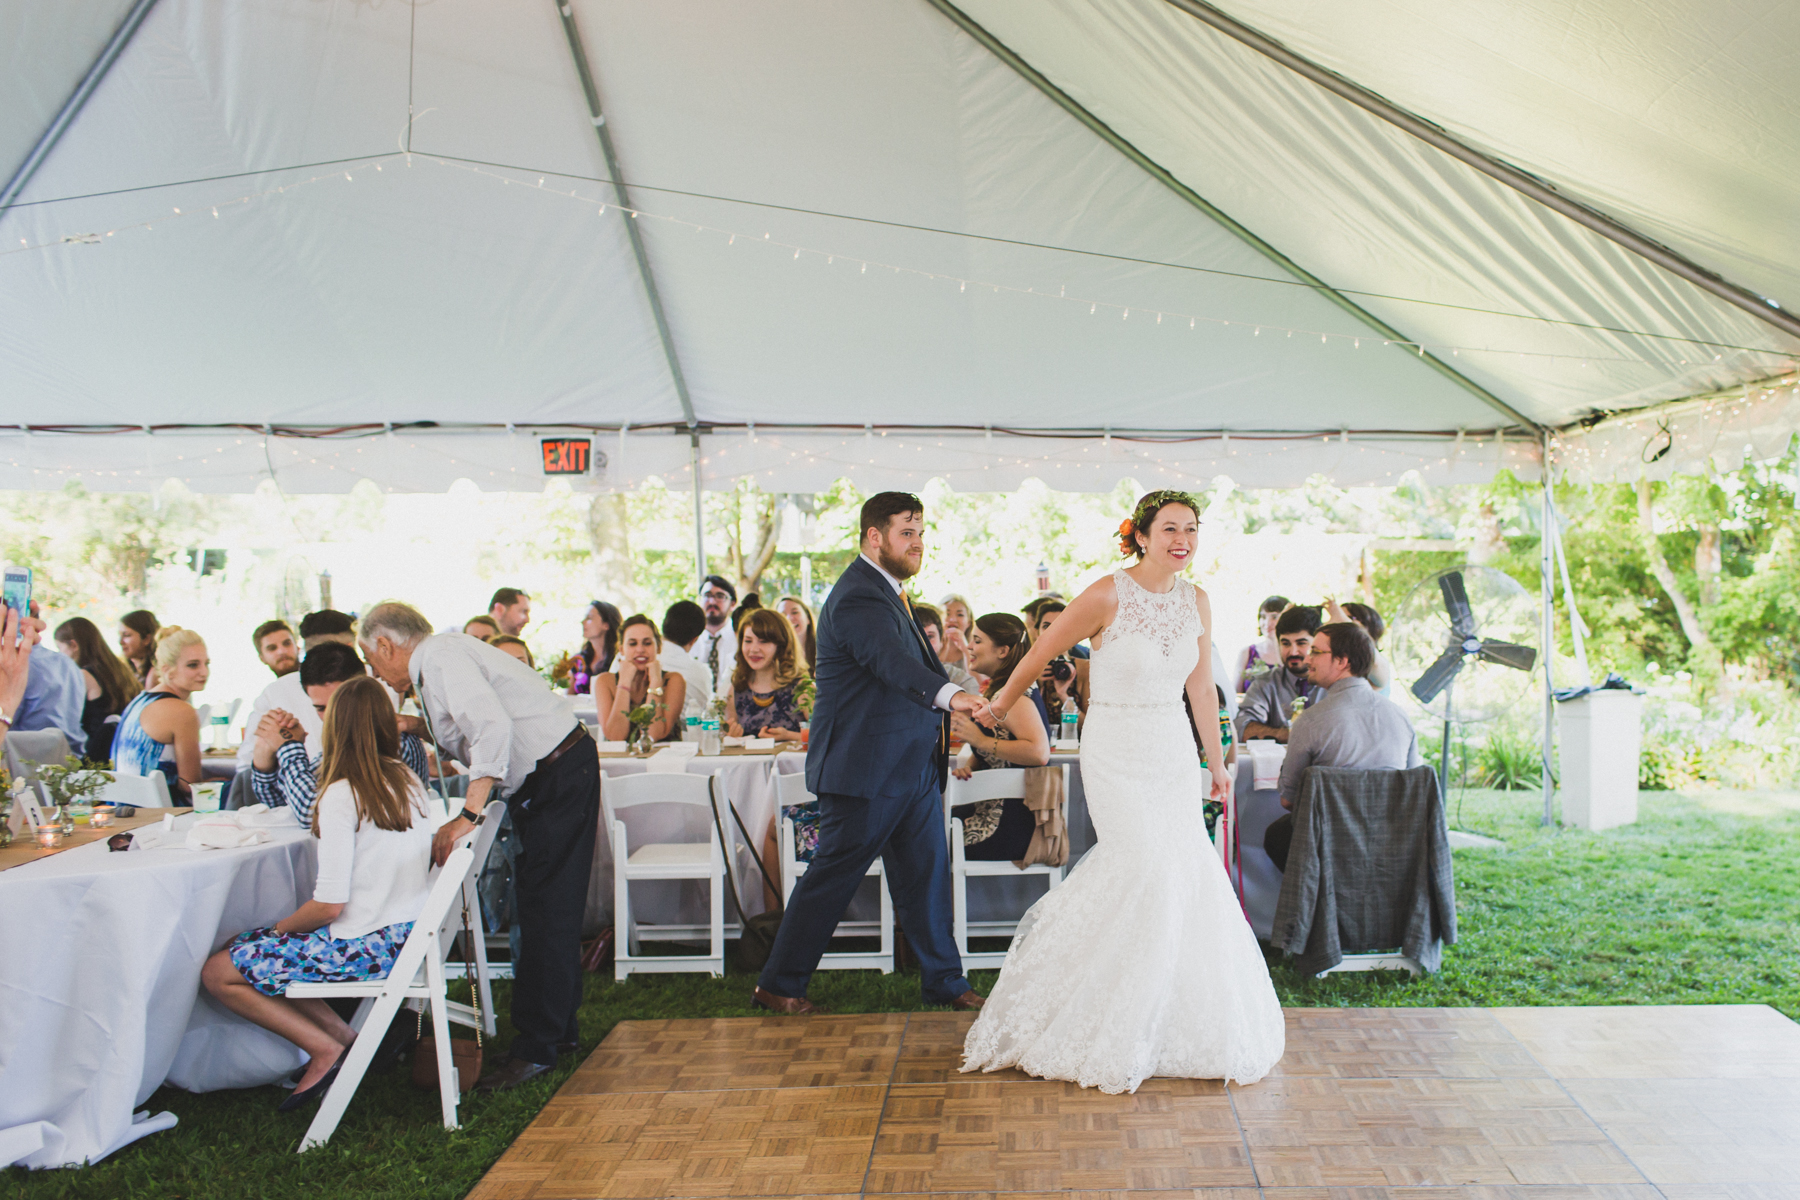 Long-Island-Documentary-Wedding-Photography-Summer-Tent-Wedding-in-New-York-98.jpg